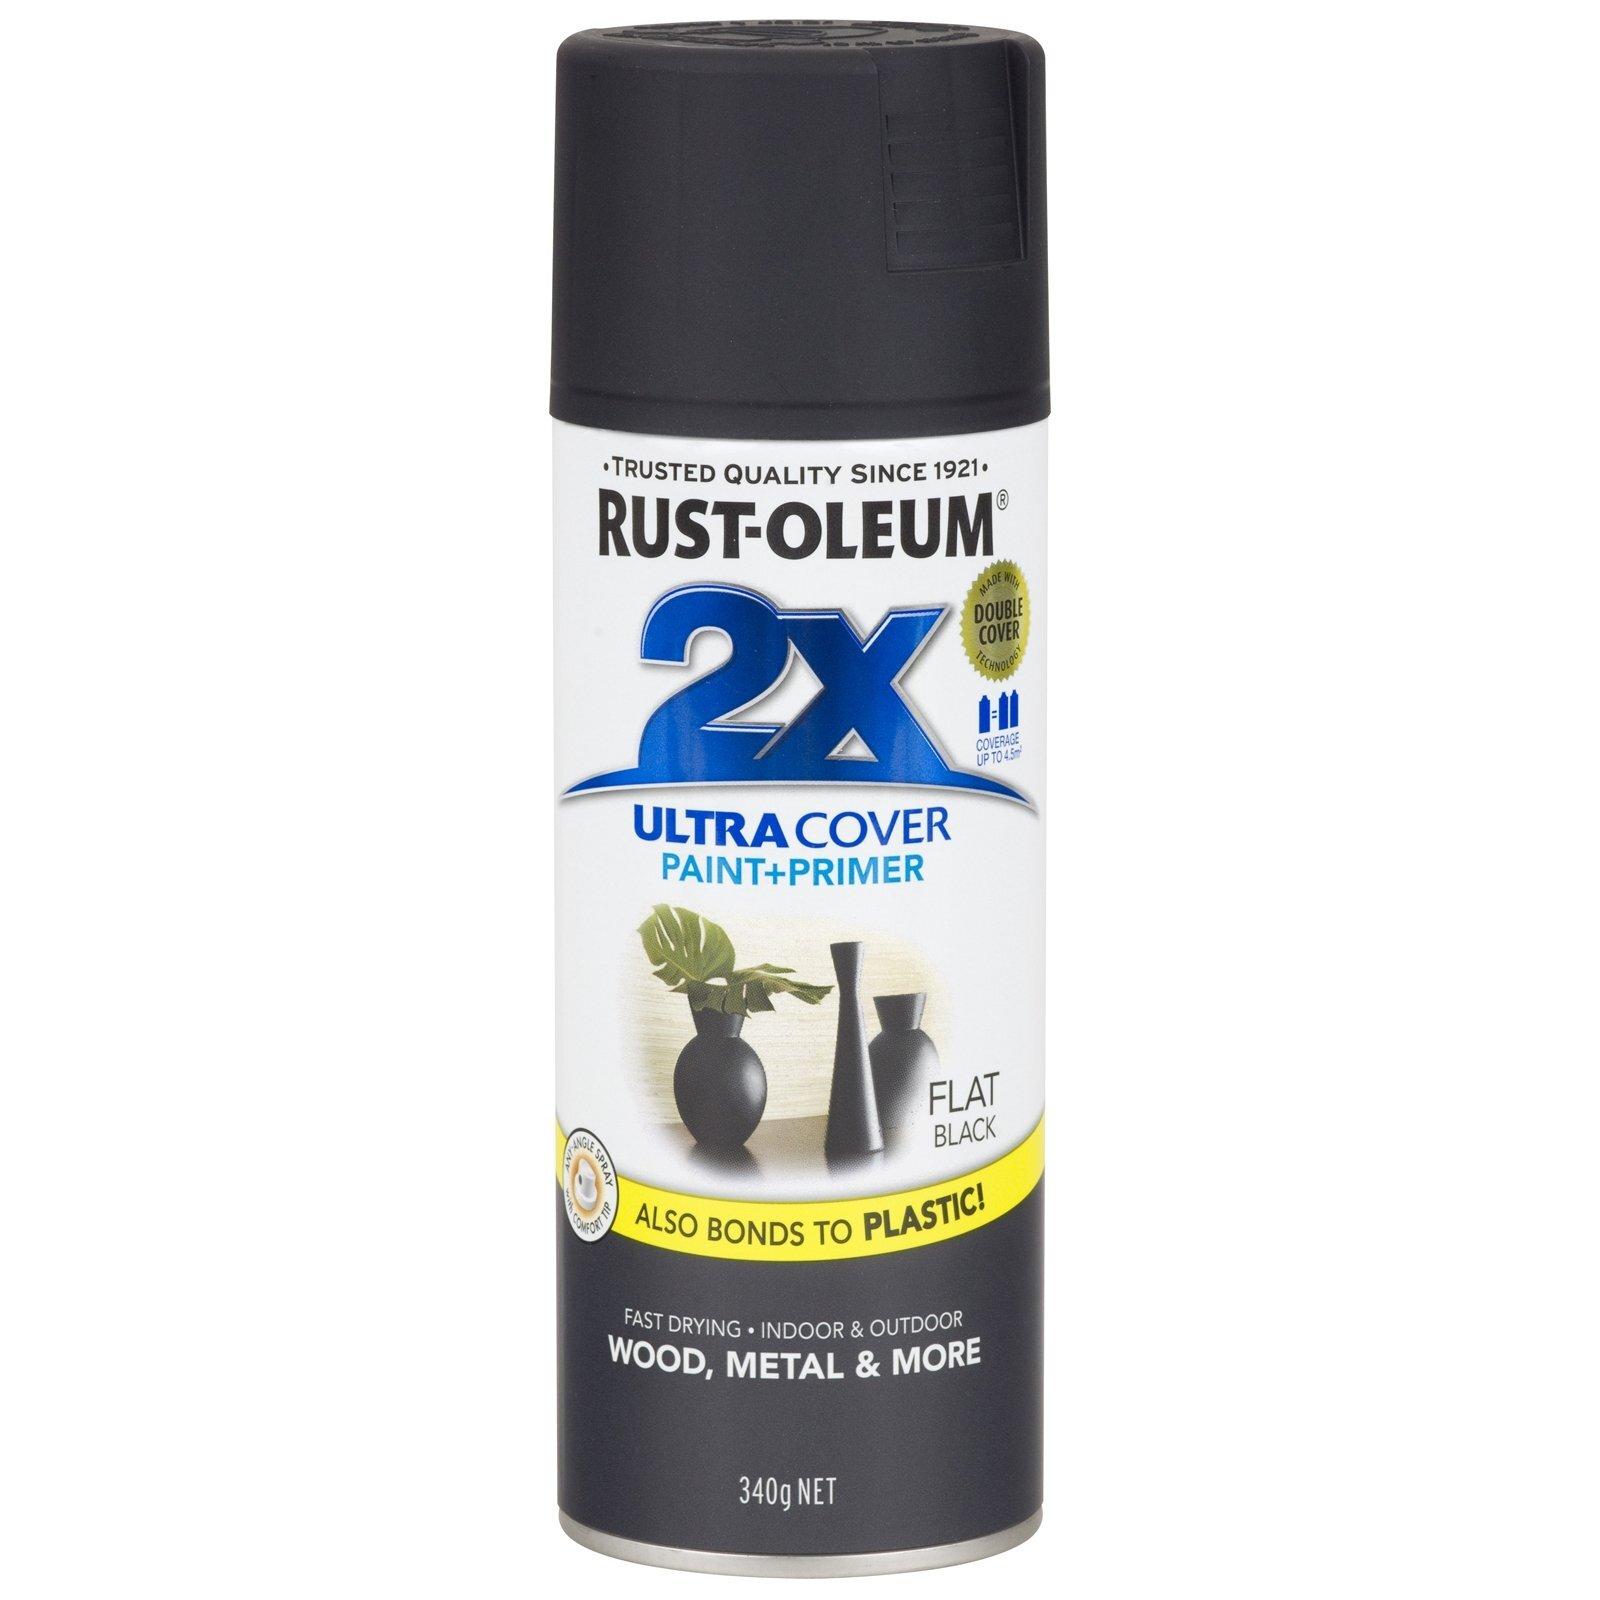 Rust-Oleum 340g 2X Ultra Cover Paint+Prime Flat Black Spray Paint